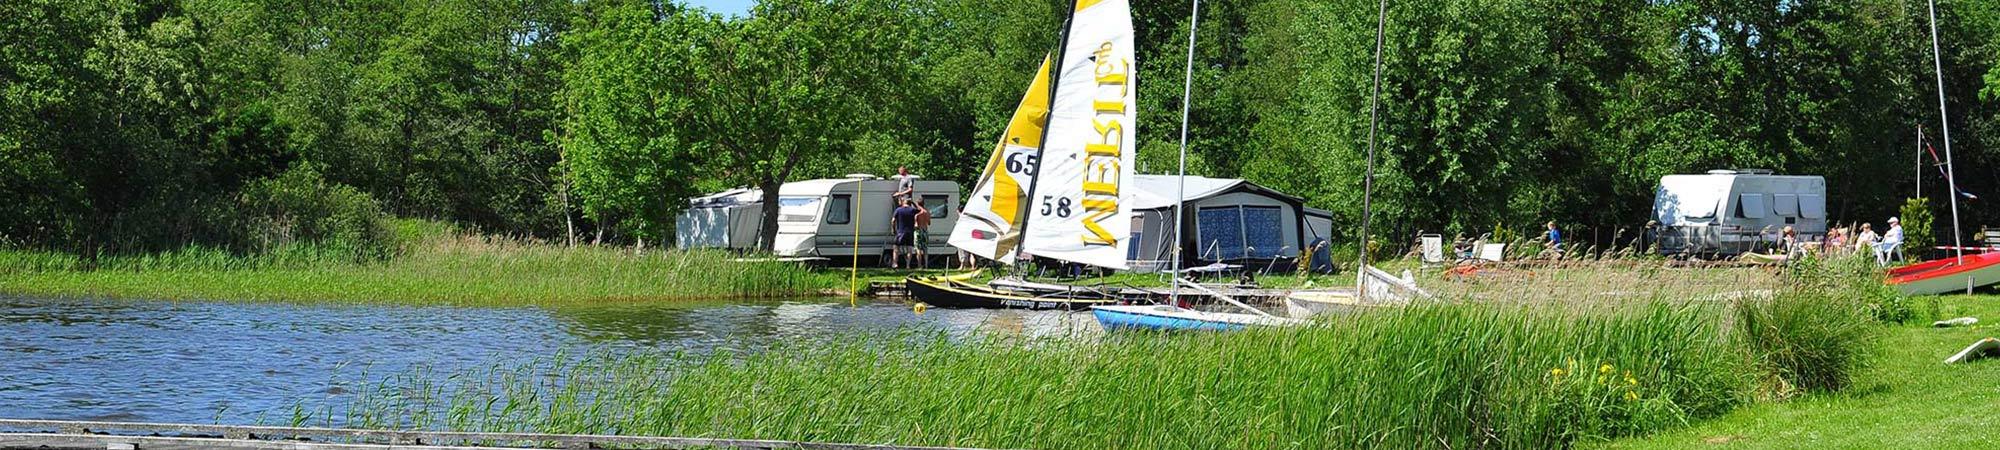 camping_aan_het_water_in_friesland